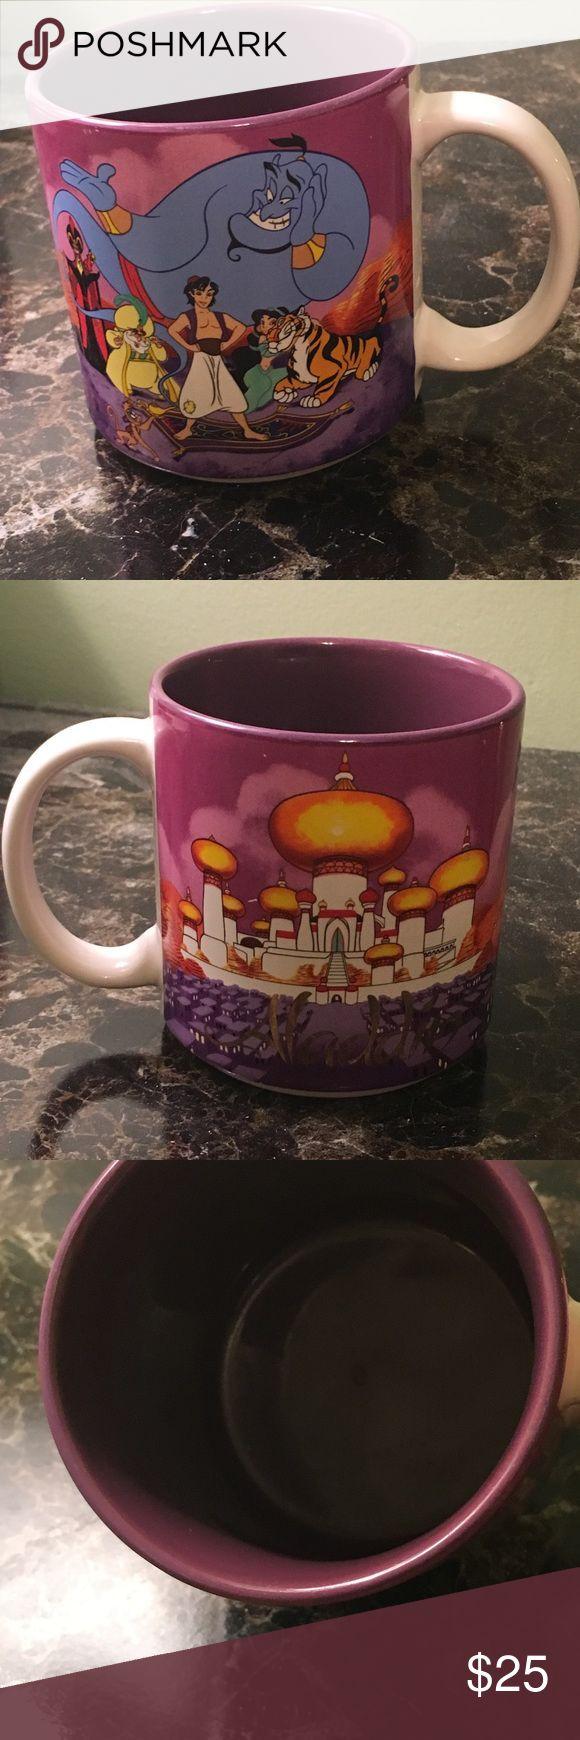 Disney Aladdin Mug Retro Ware Classic Coffee Mug Classic Aladdin Disney Mug. No chips. Cracks, or flaws. Normal wear from use. Disney Other